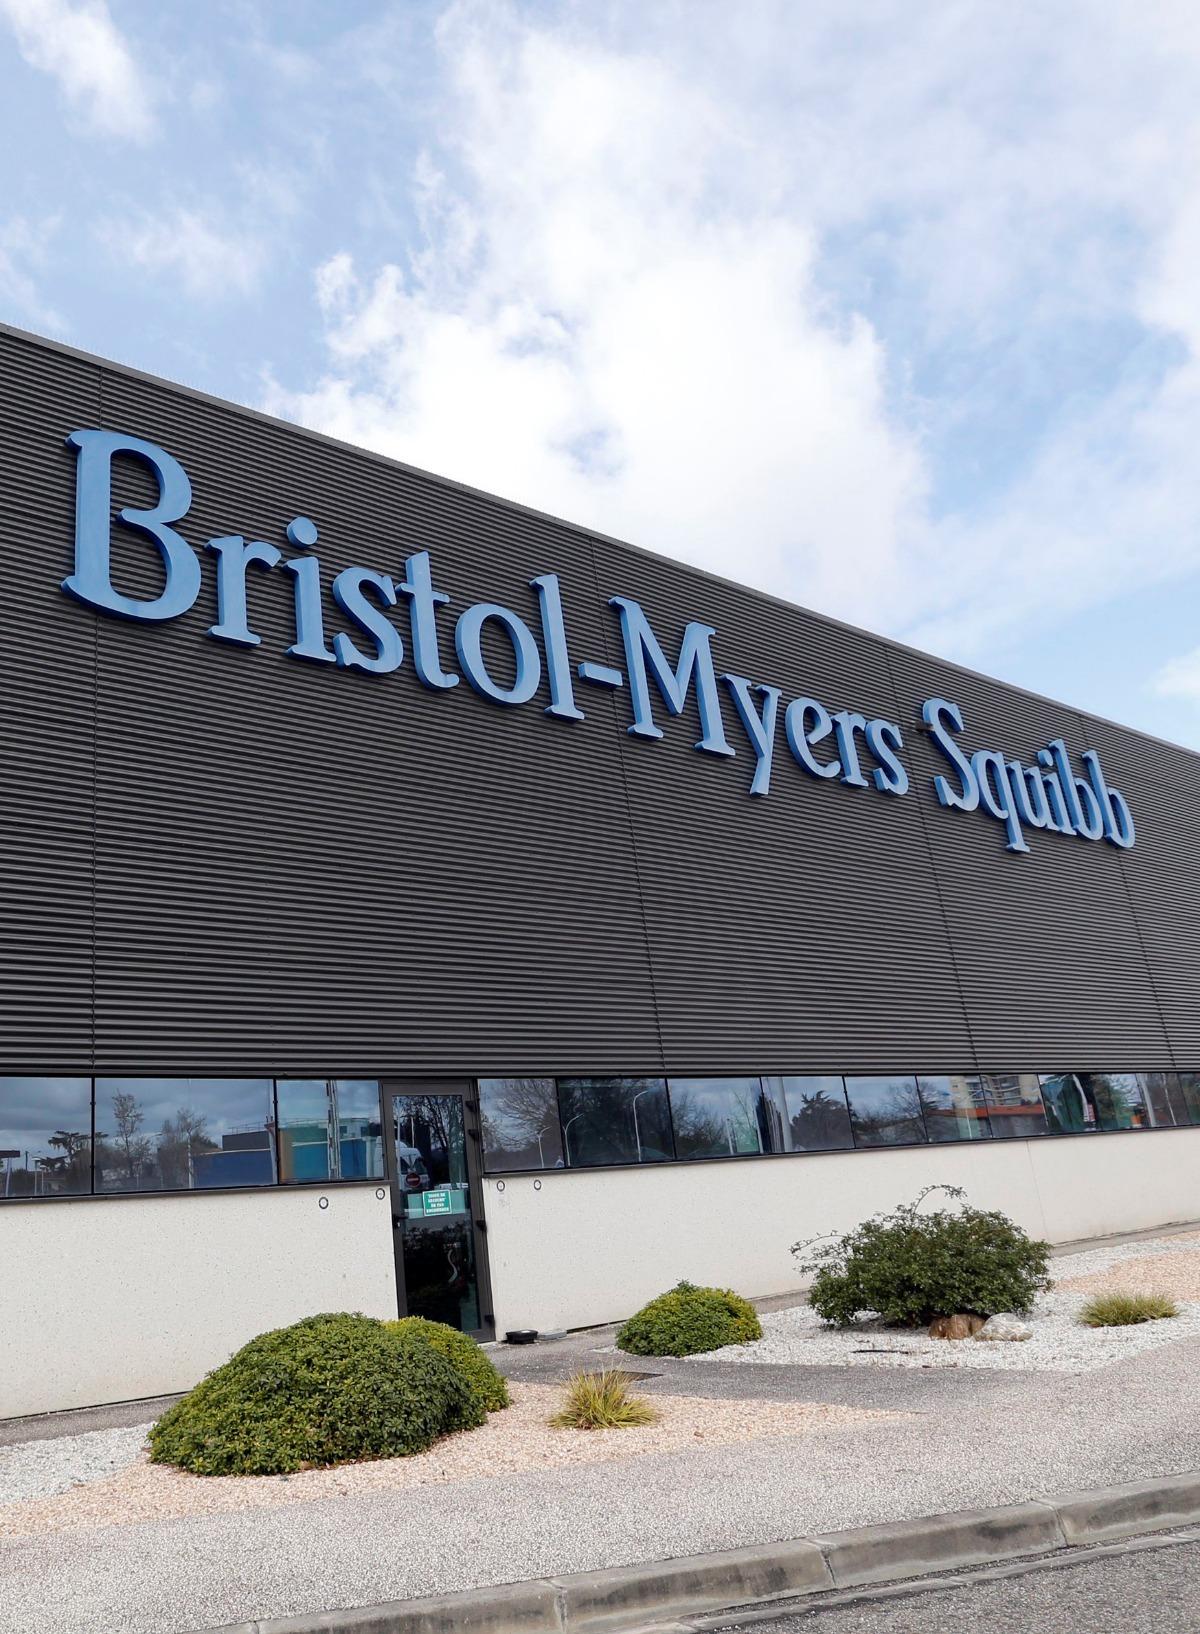 Bristol-Celgene deal could spur more pharma mergers - Reuters TV